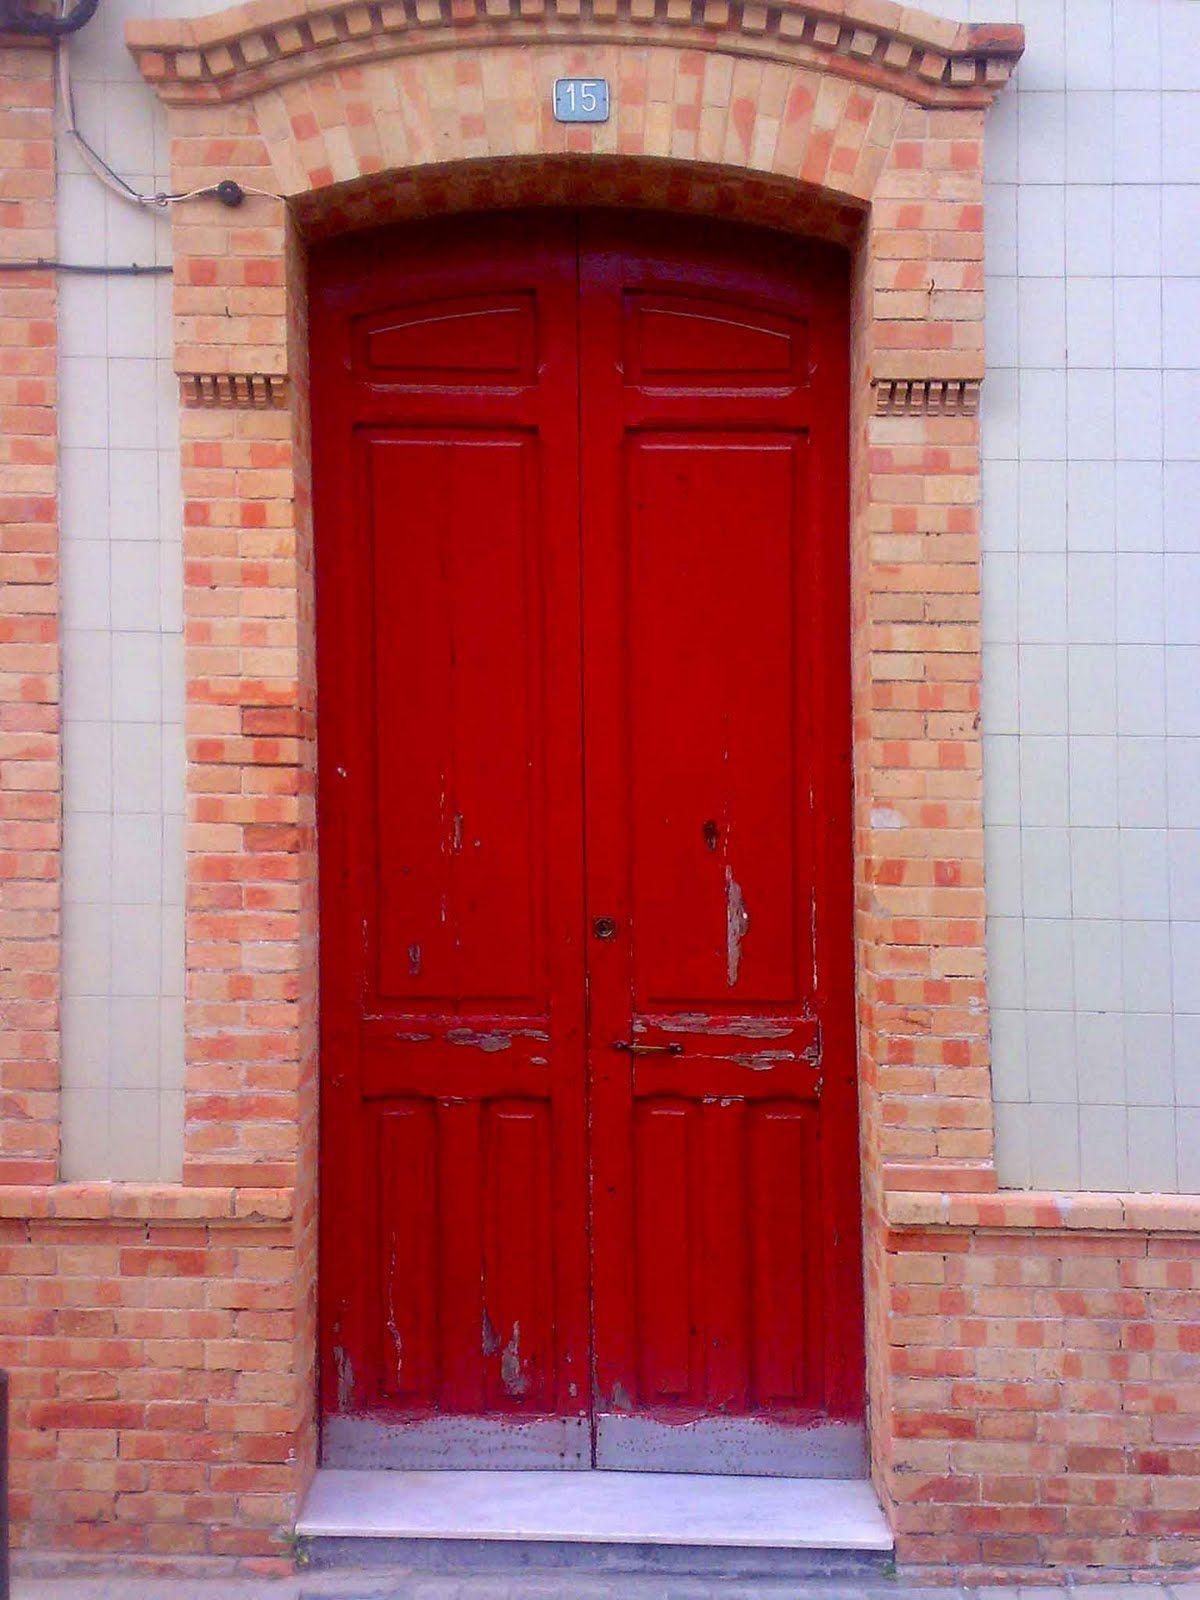 Huelva según Choco Tóxico Puertas antiguas de Huelva I & Huelva según Choco Tóxico: Puertas antiguas de Huelva I | PUERTAS ...